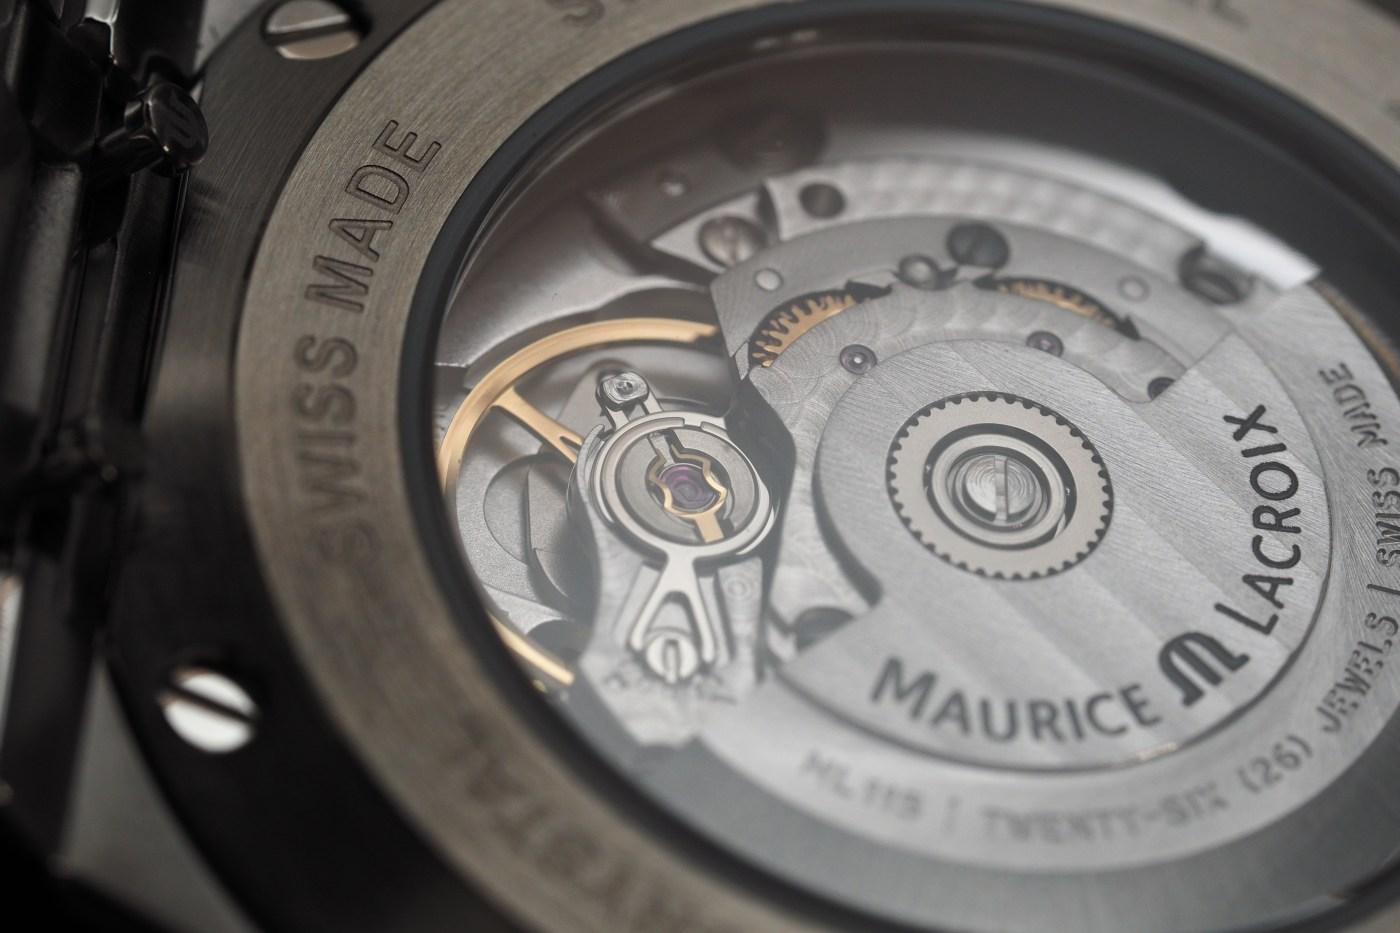 Maurice Lacroix Aikon Automatic caseback